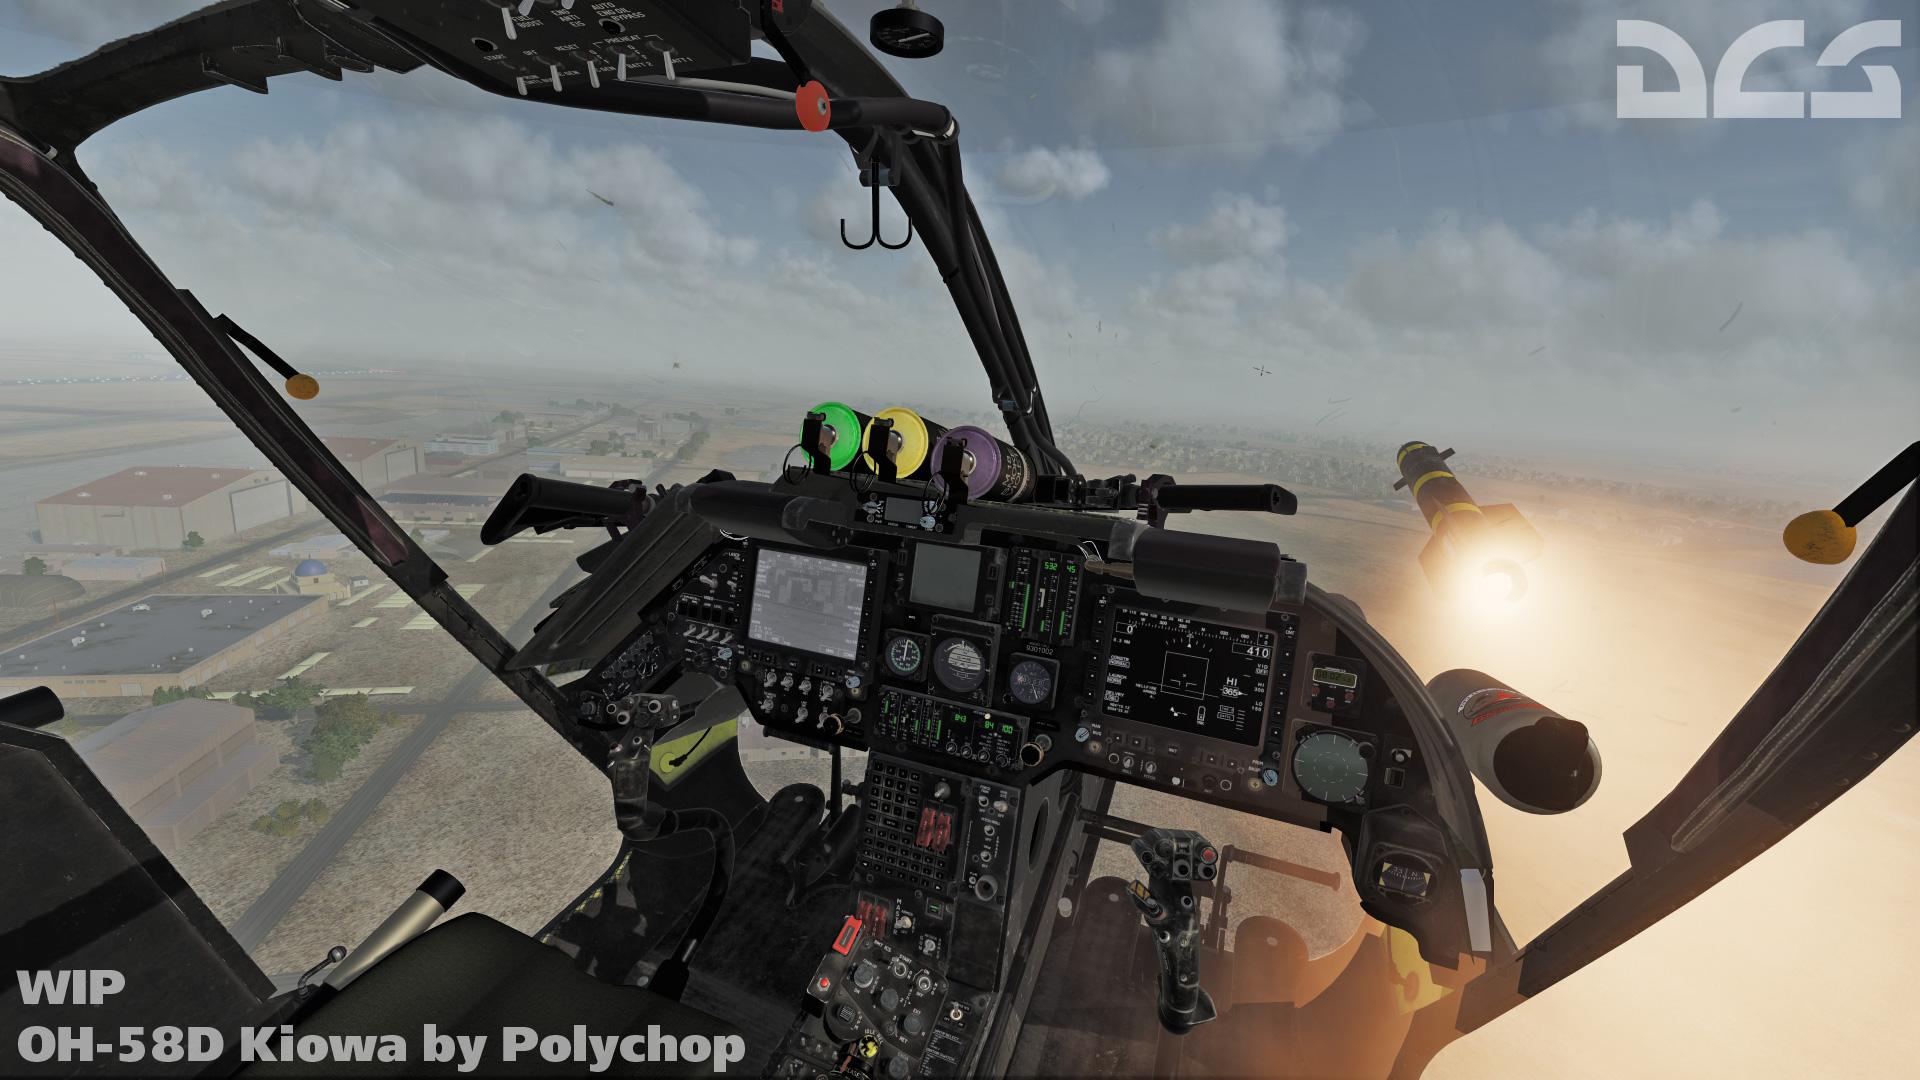 OH-58D-Kiowa-03.jpg